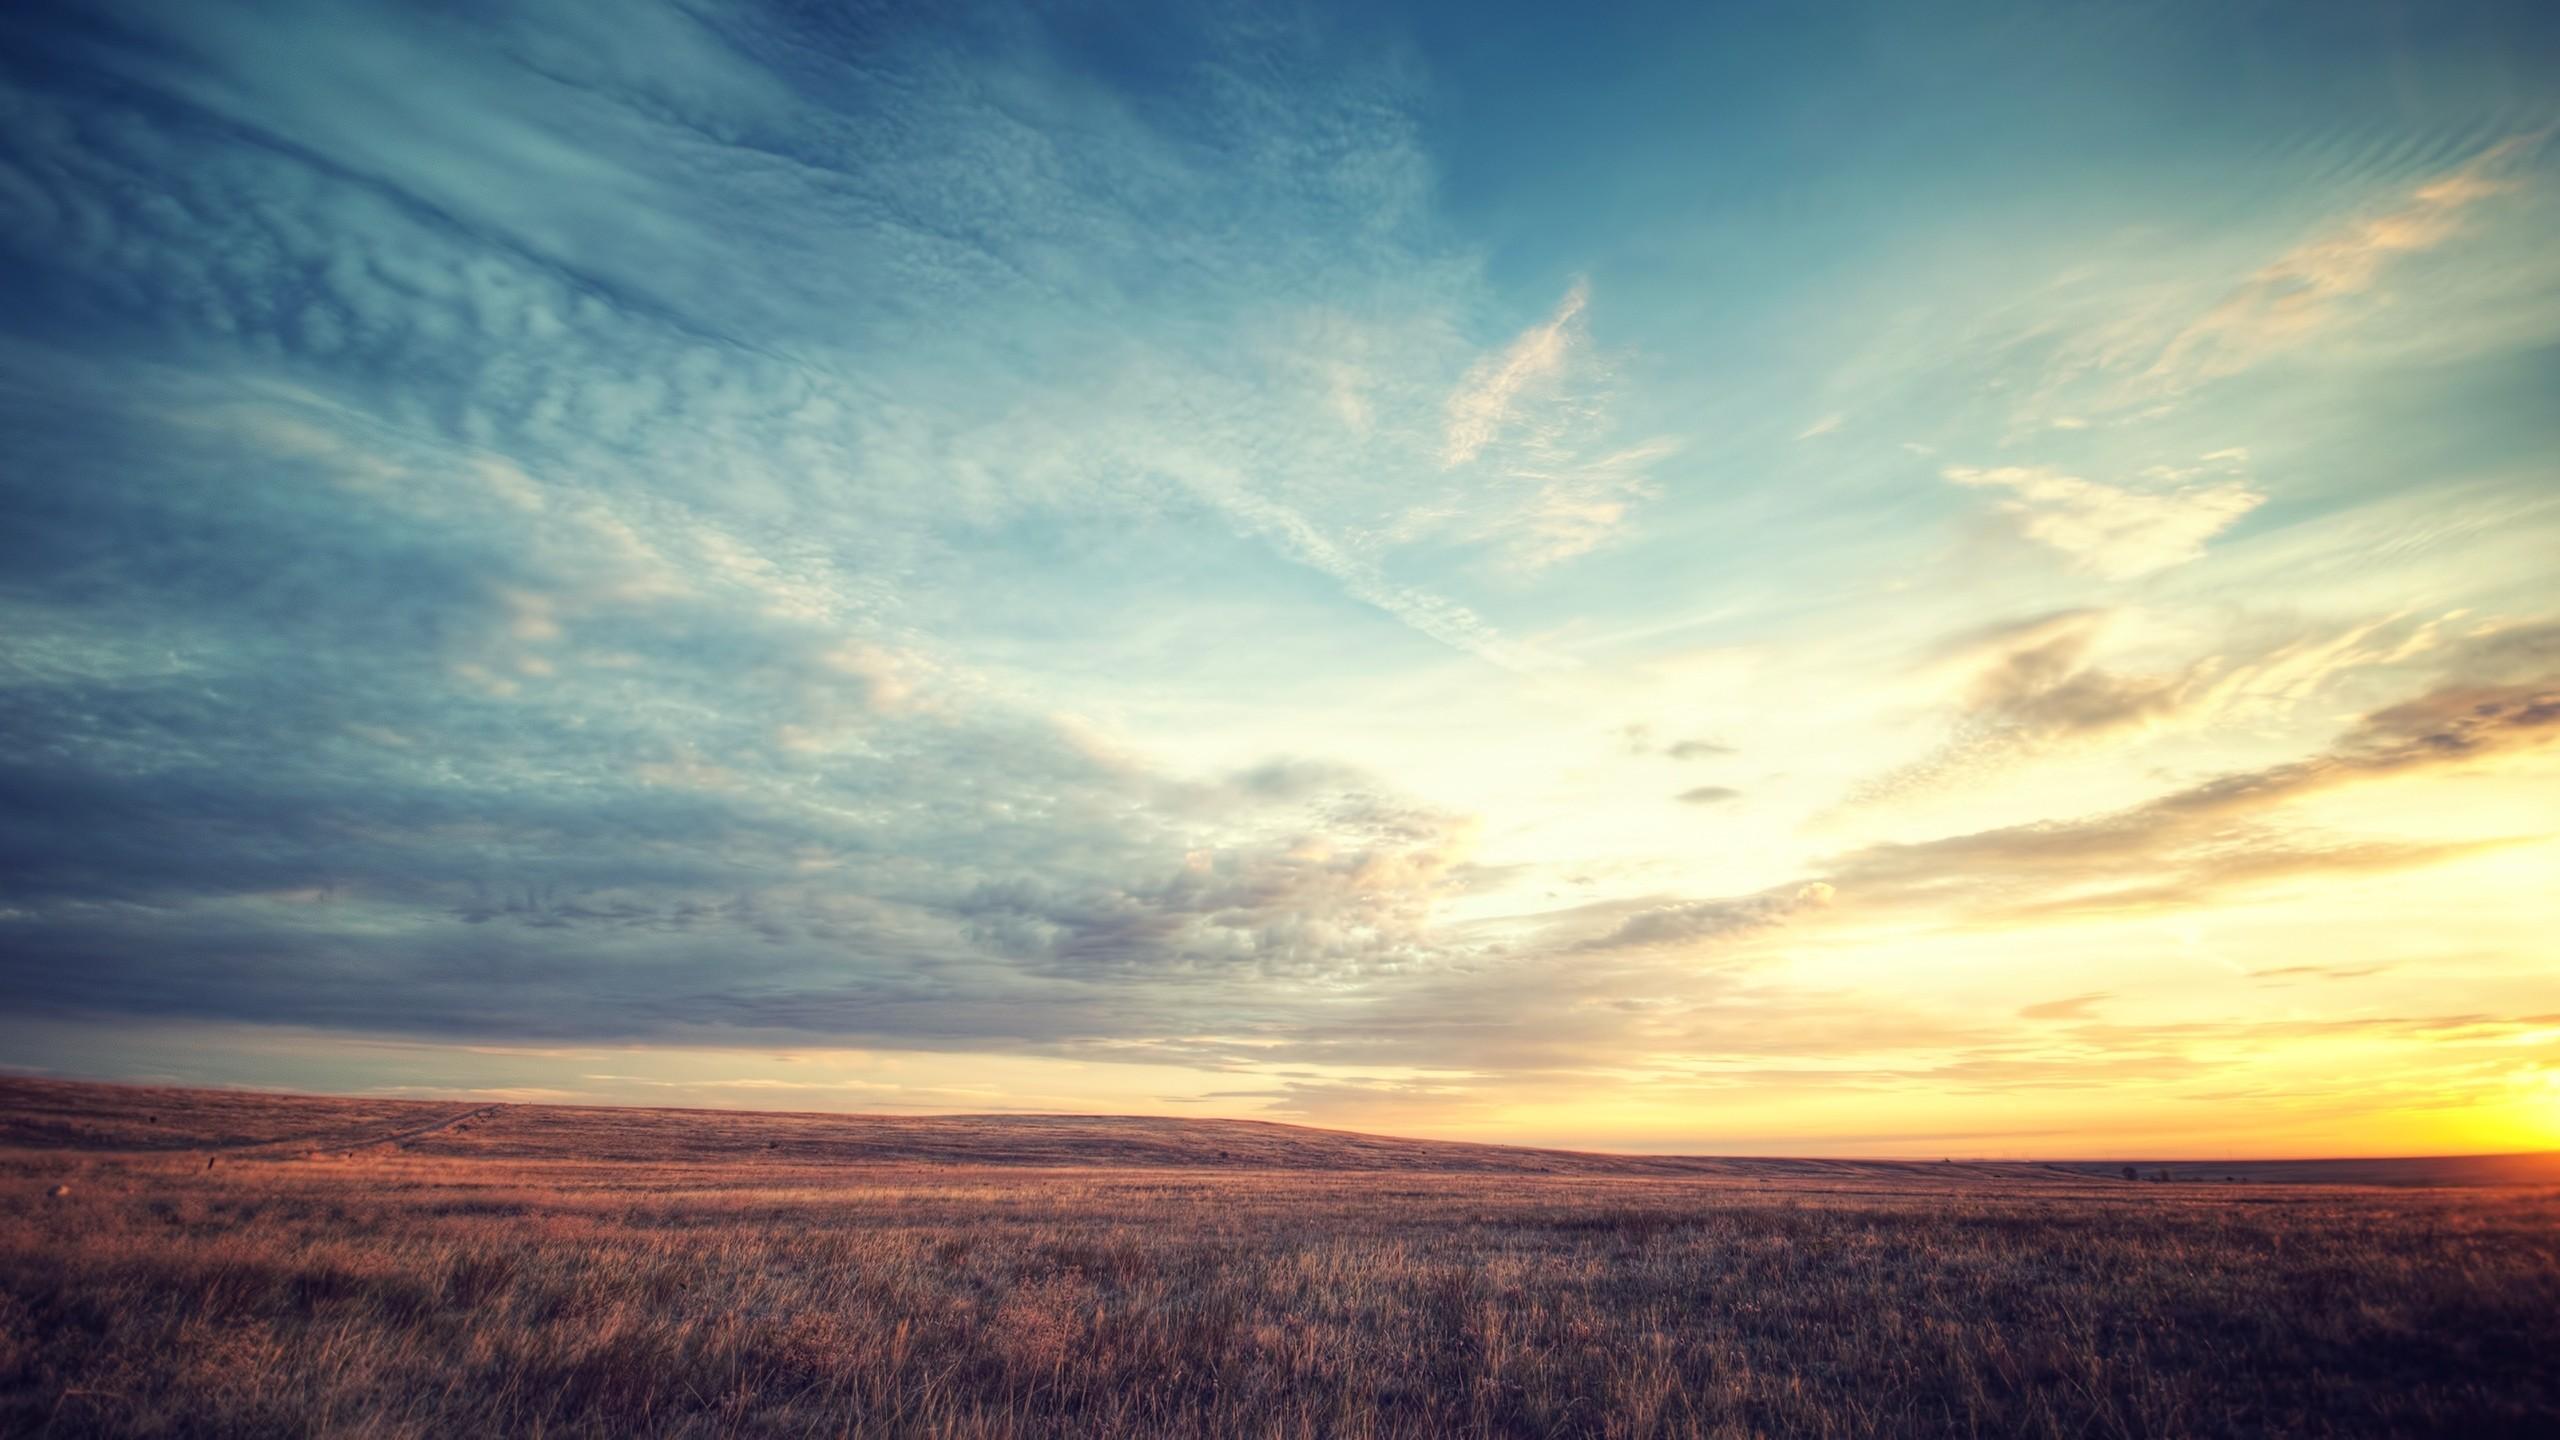 Preview wallpaper field, dawn, sky, beautiful scenery 2560×1440